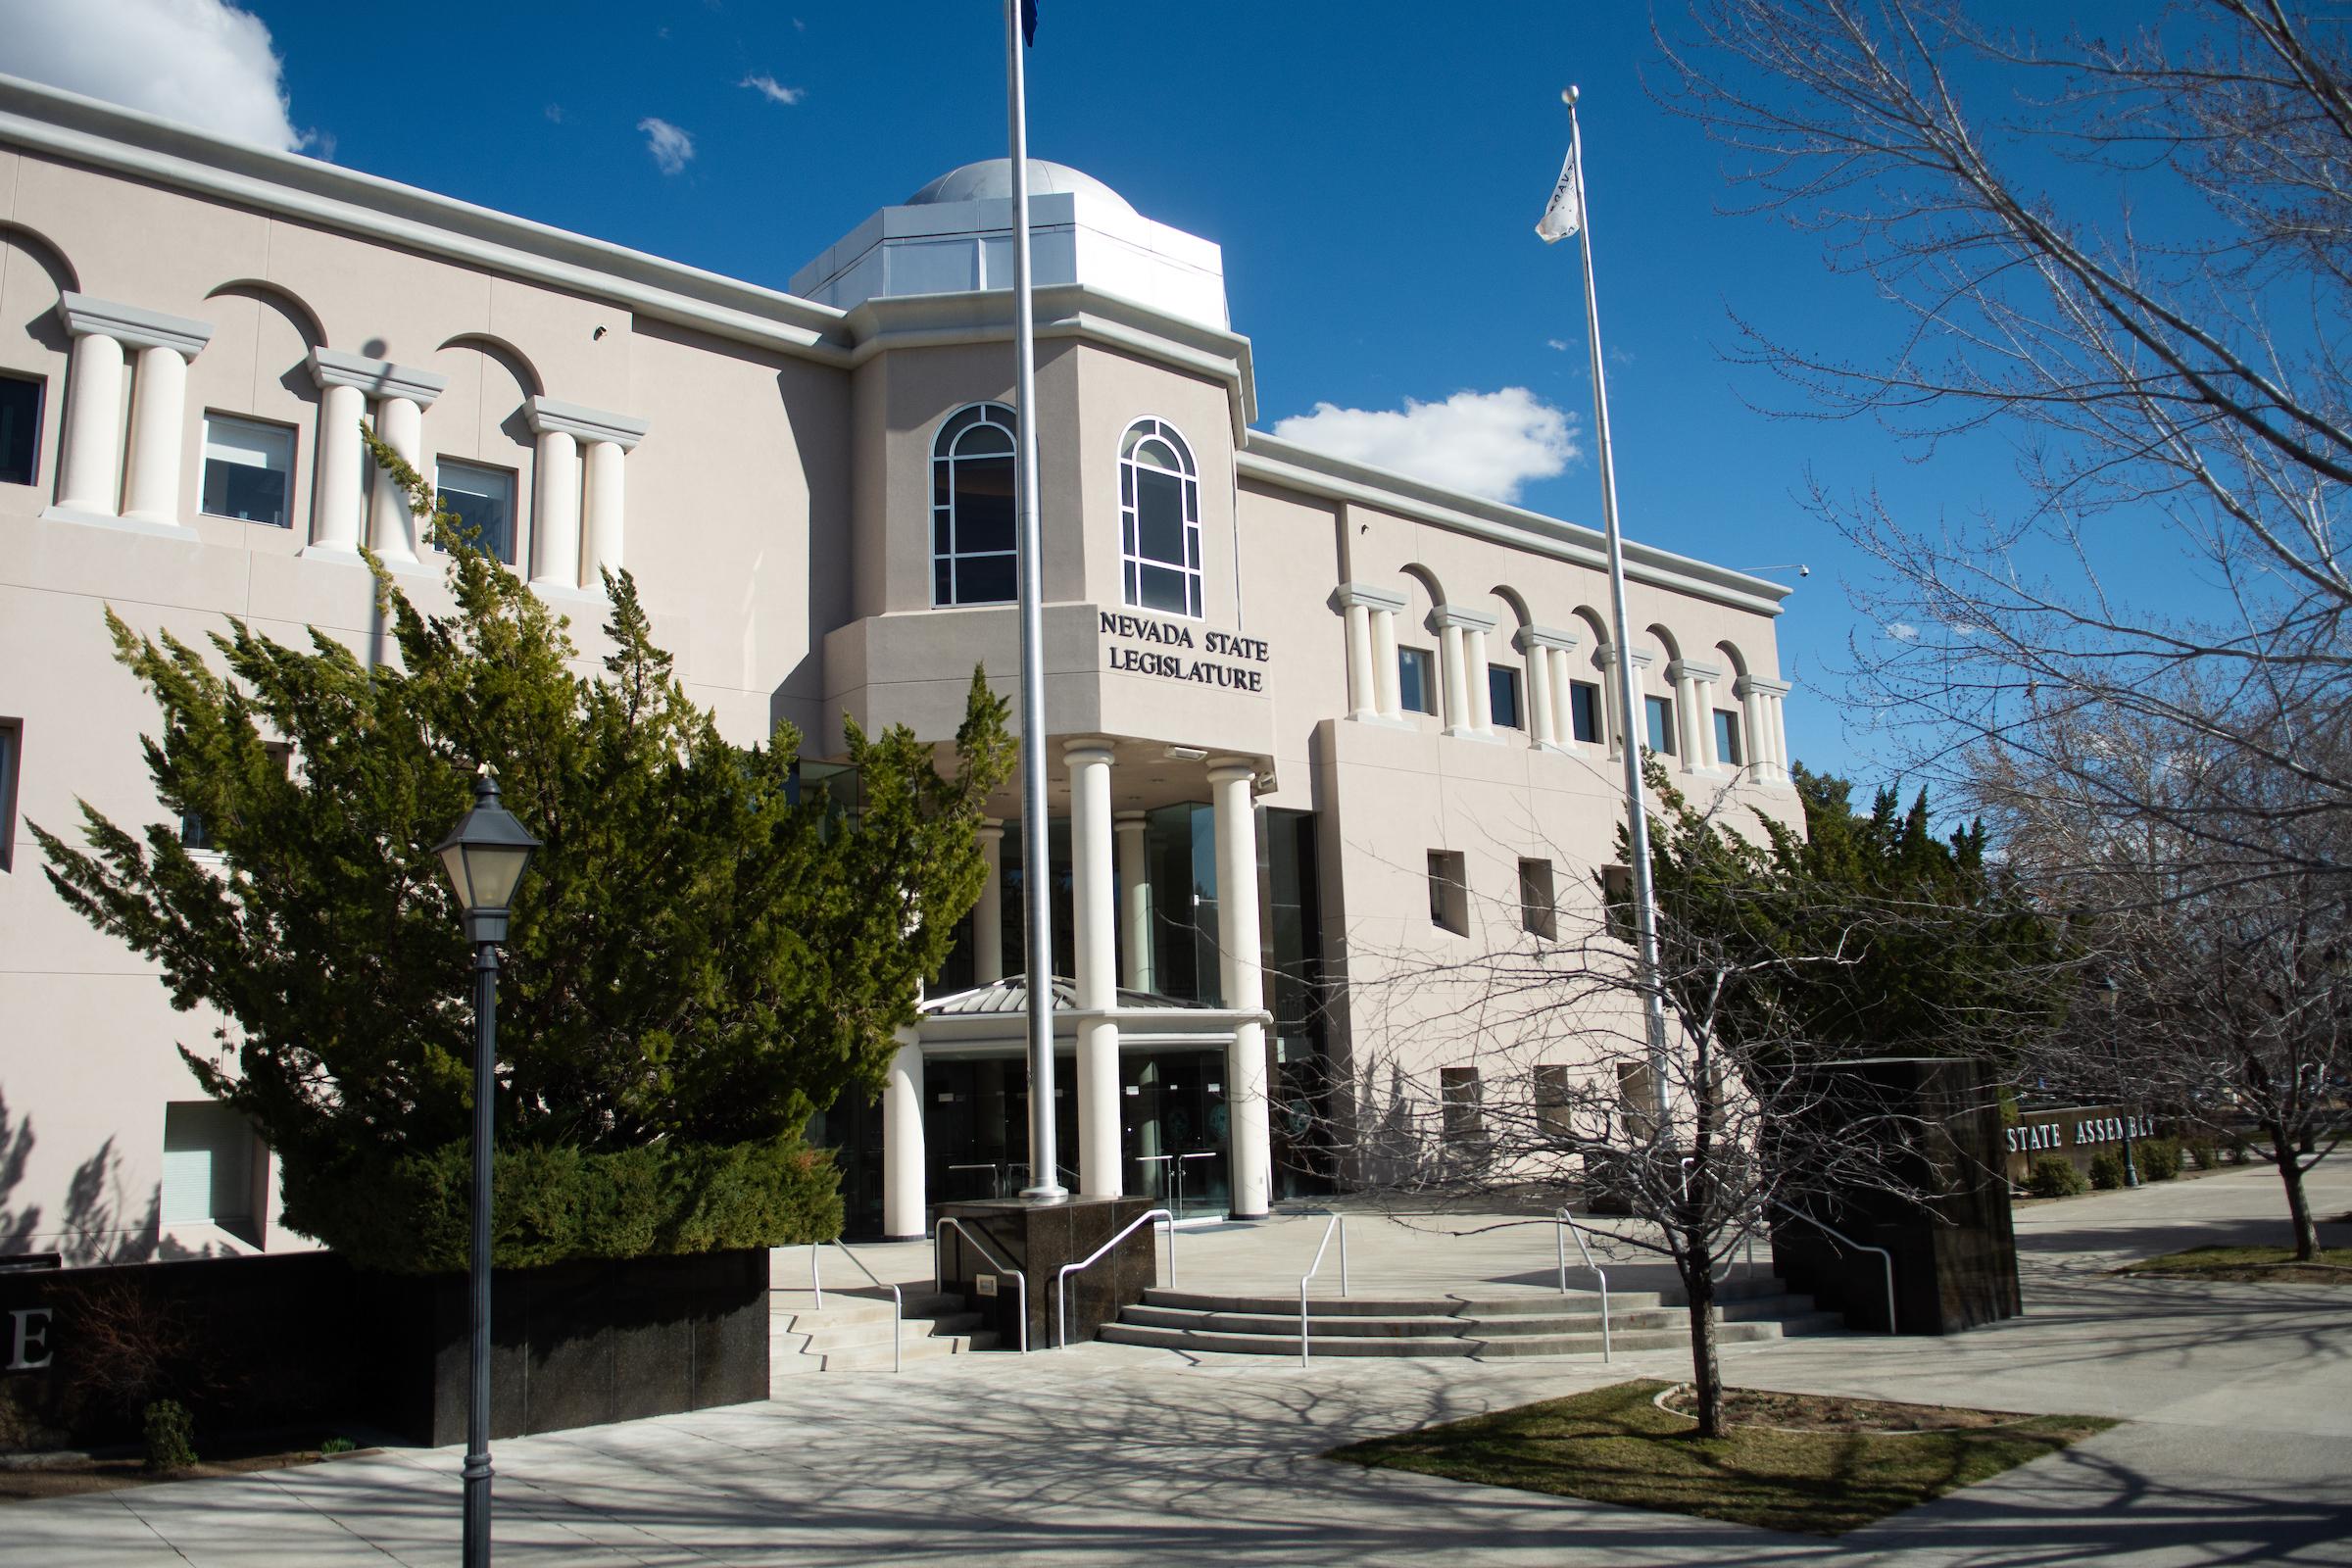 Photo of the Nevada Legislature building